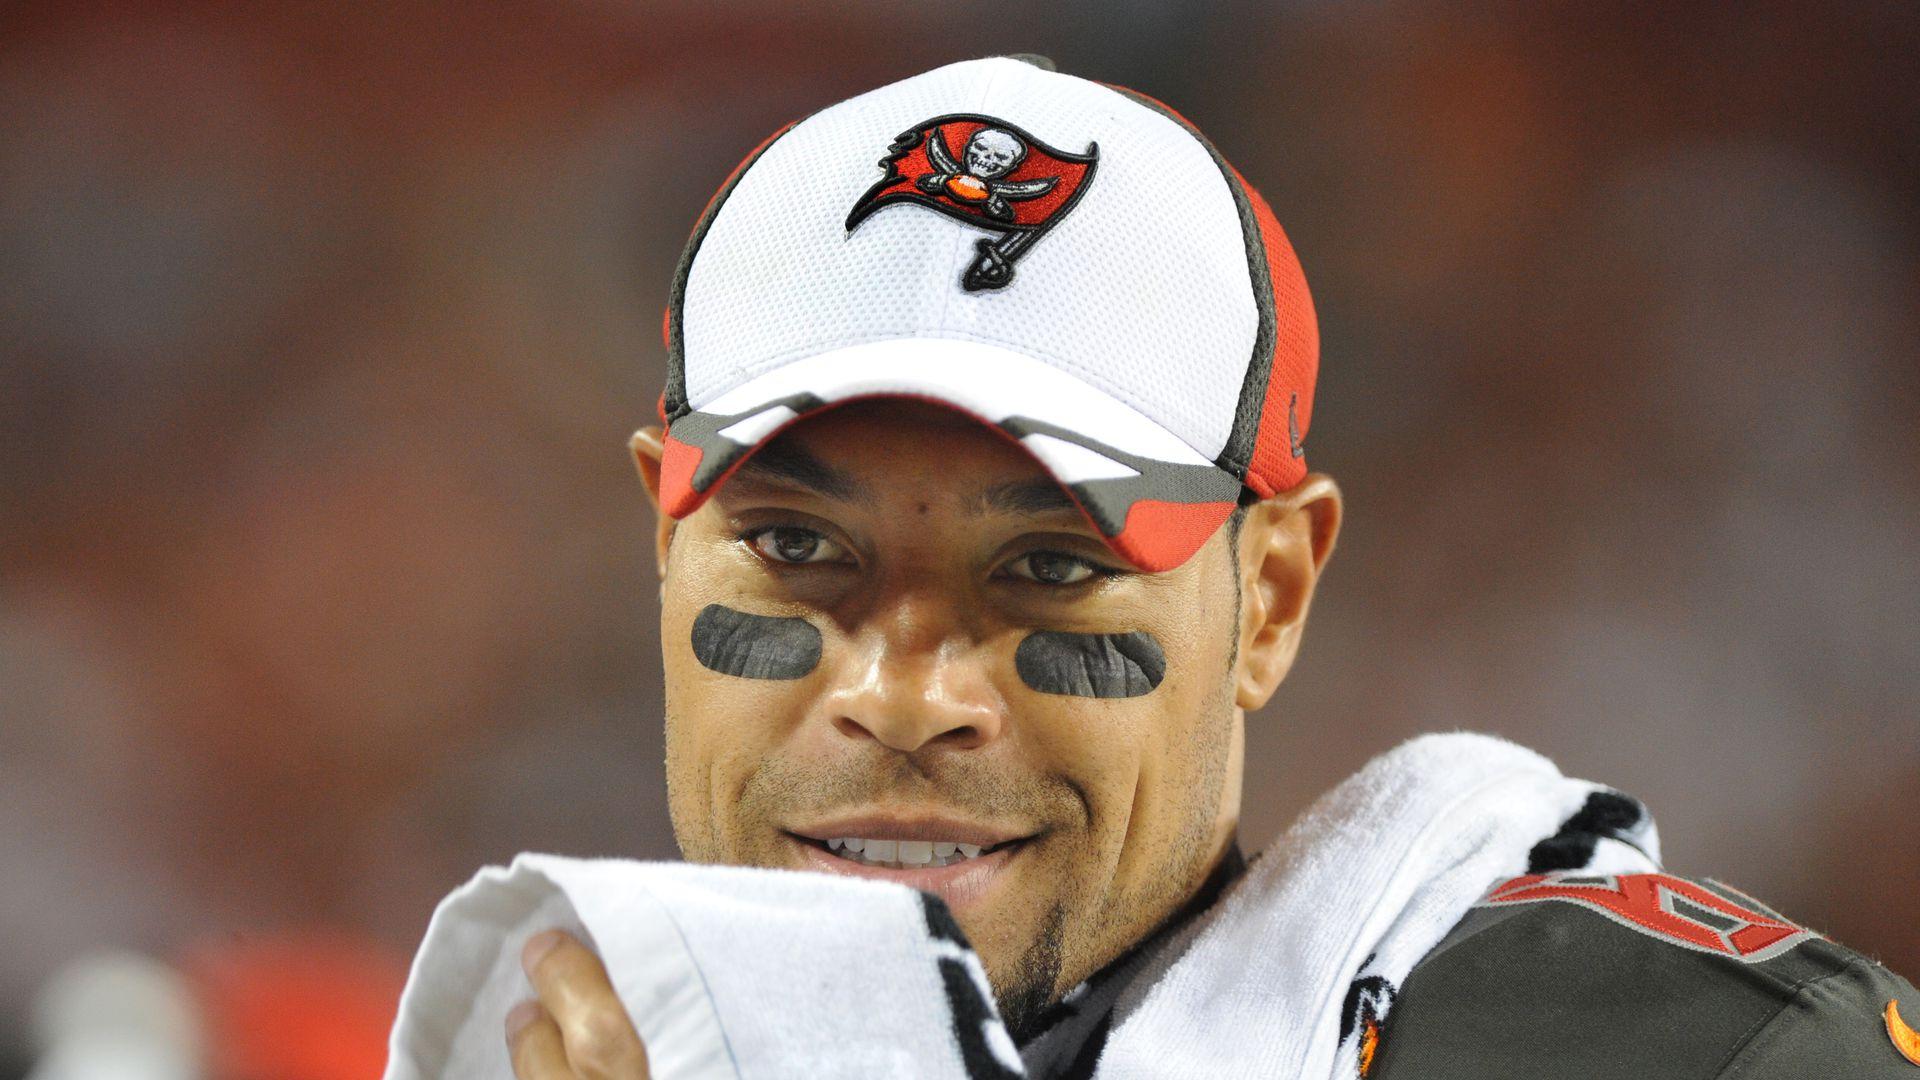 NFL-Star Vincent Jackson (38) tot in Hotelzimmer aufgefunden - Promiflash.de